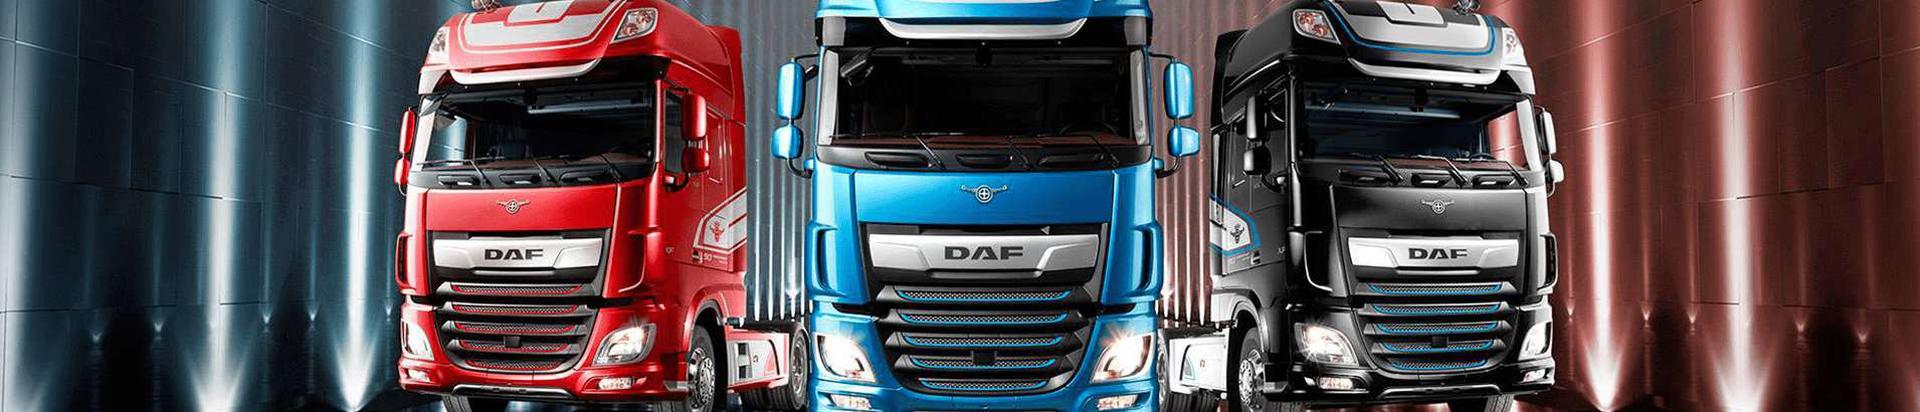 10986077_truck-trading-estonia-ou_40888875_xl.jpg